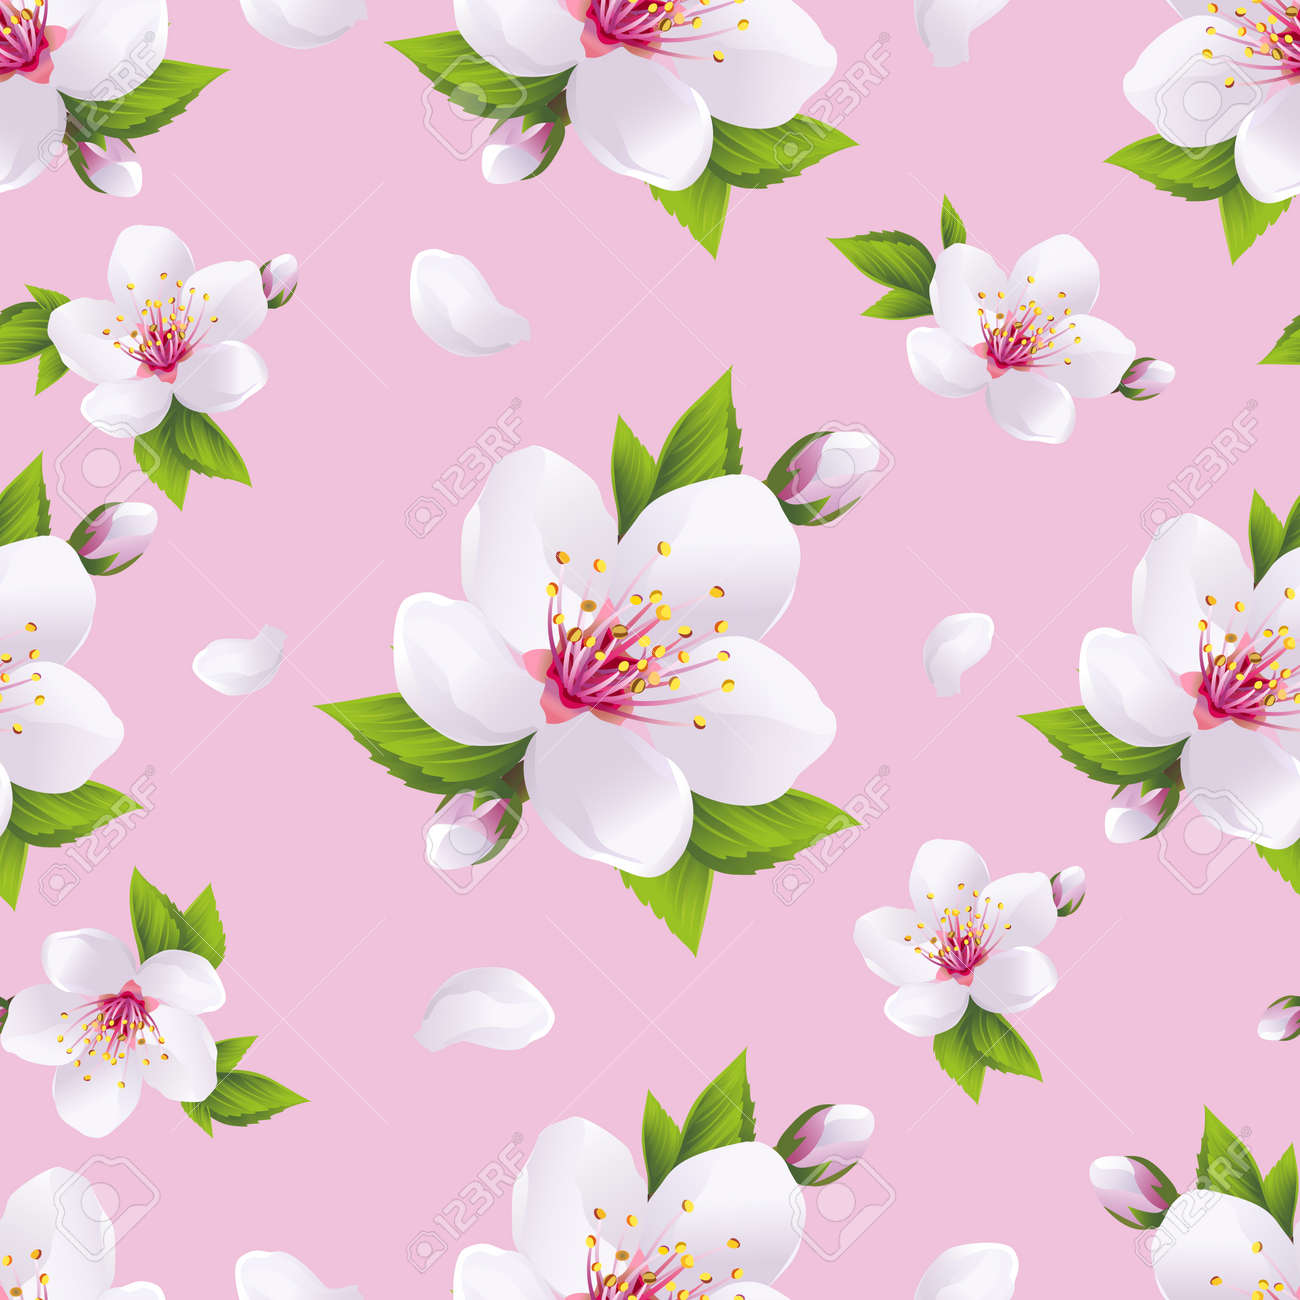 Belle Fond Clair Seamless Blanc Sakura Blossom Cerisier Japonais